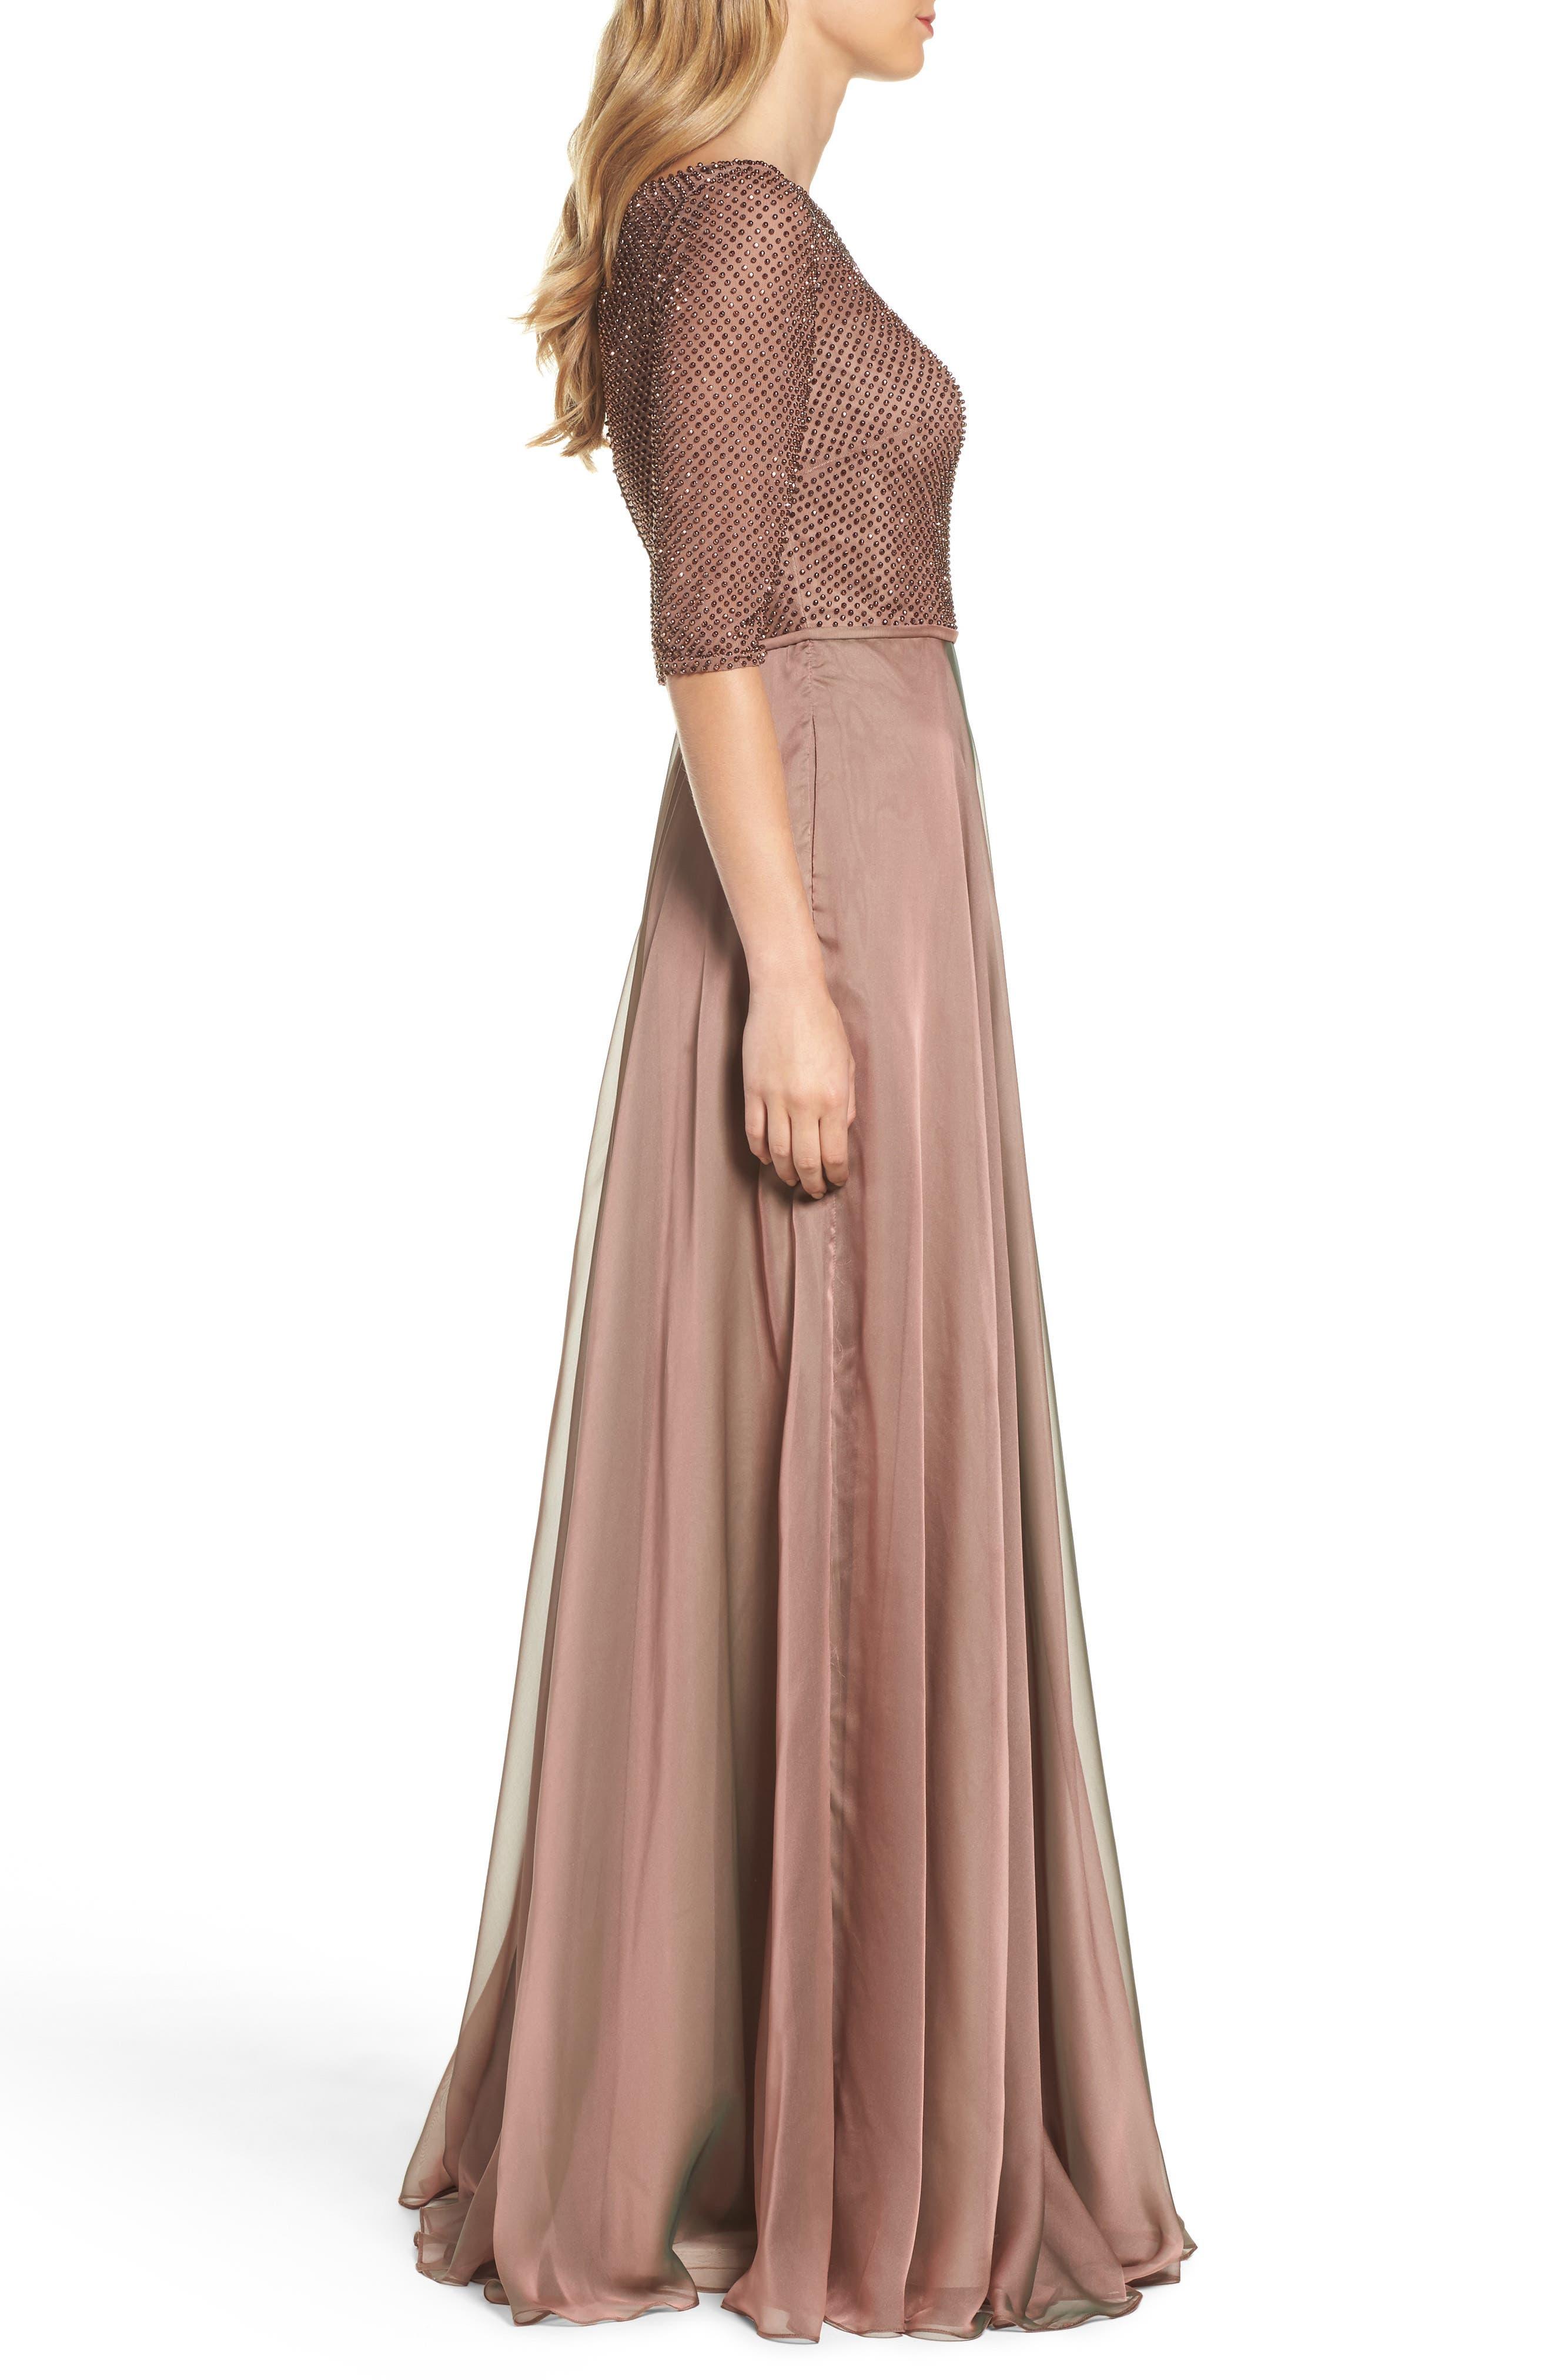 LA FEMME, Embellished Bodice Gown, Alternate thumbnail 3, color, COCOA